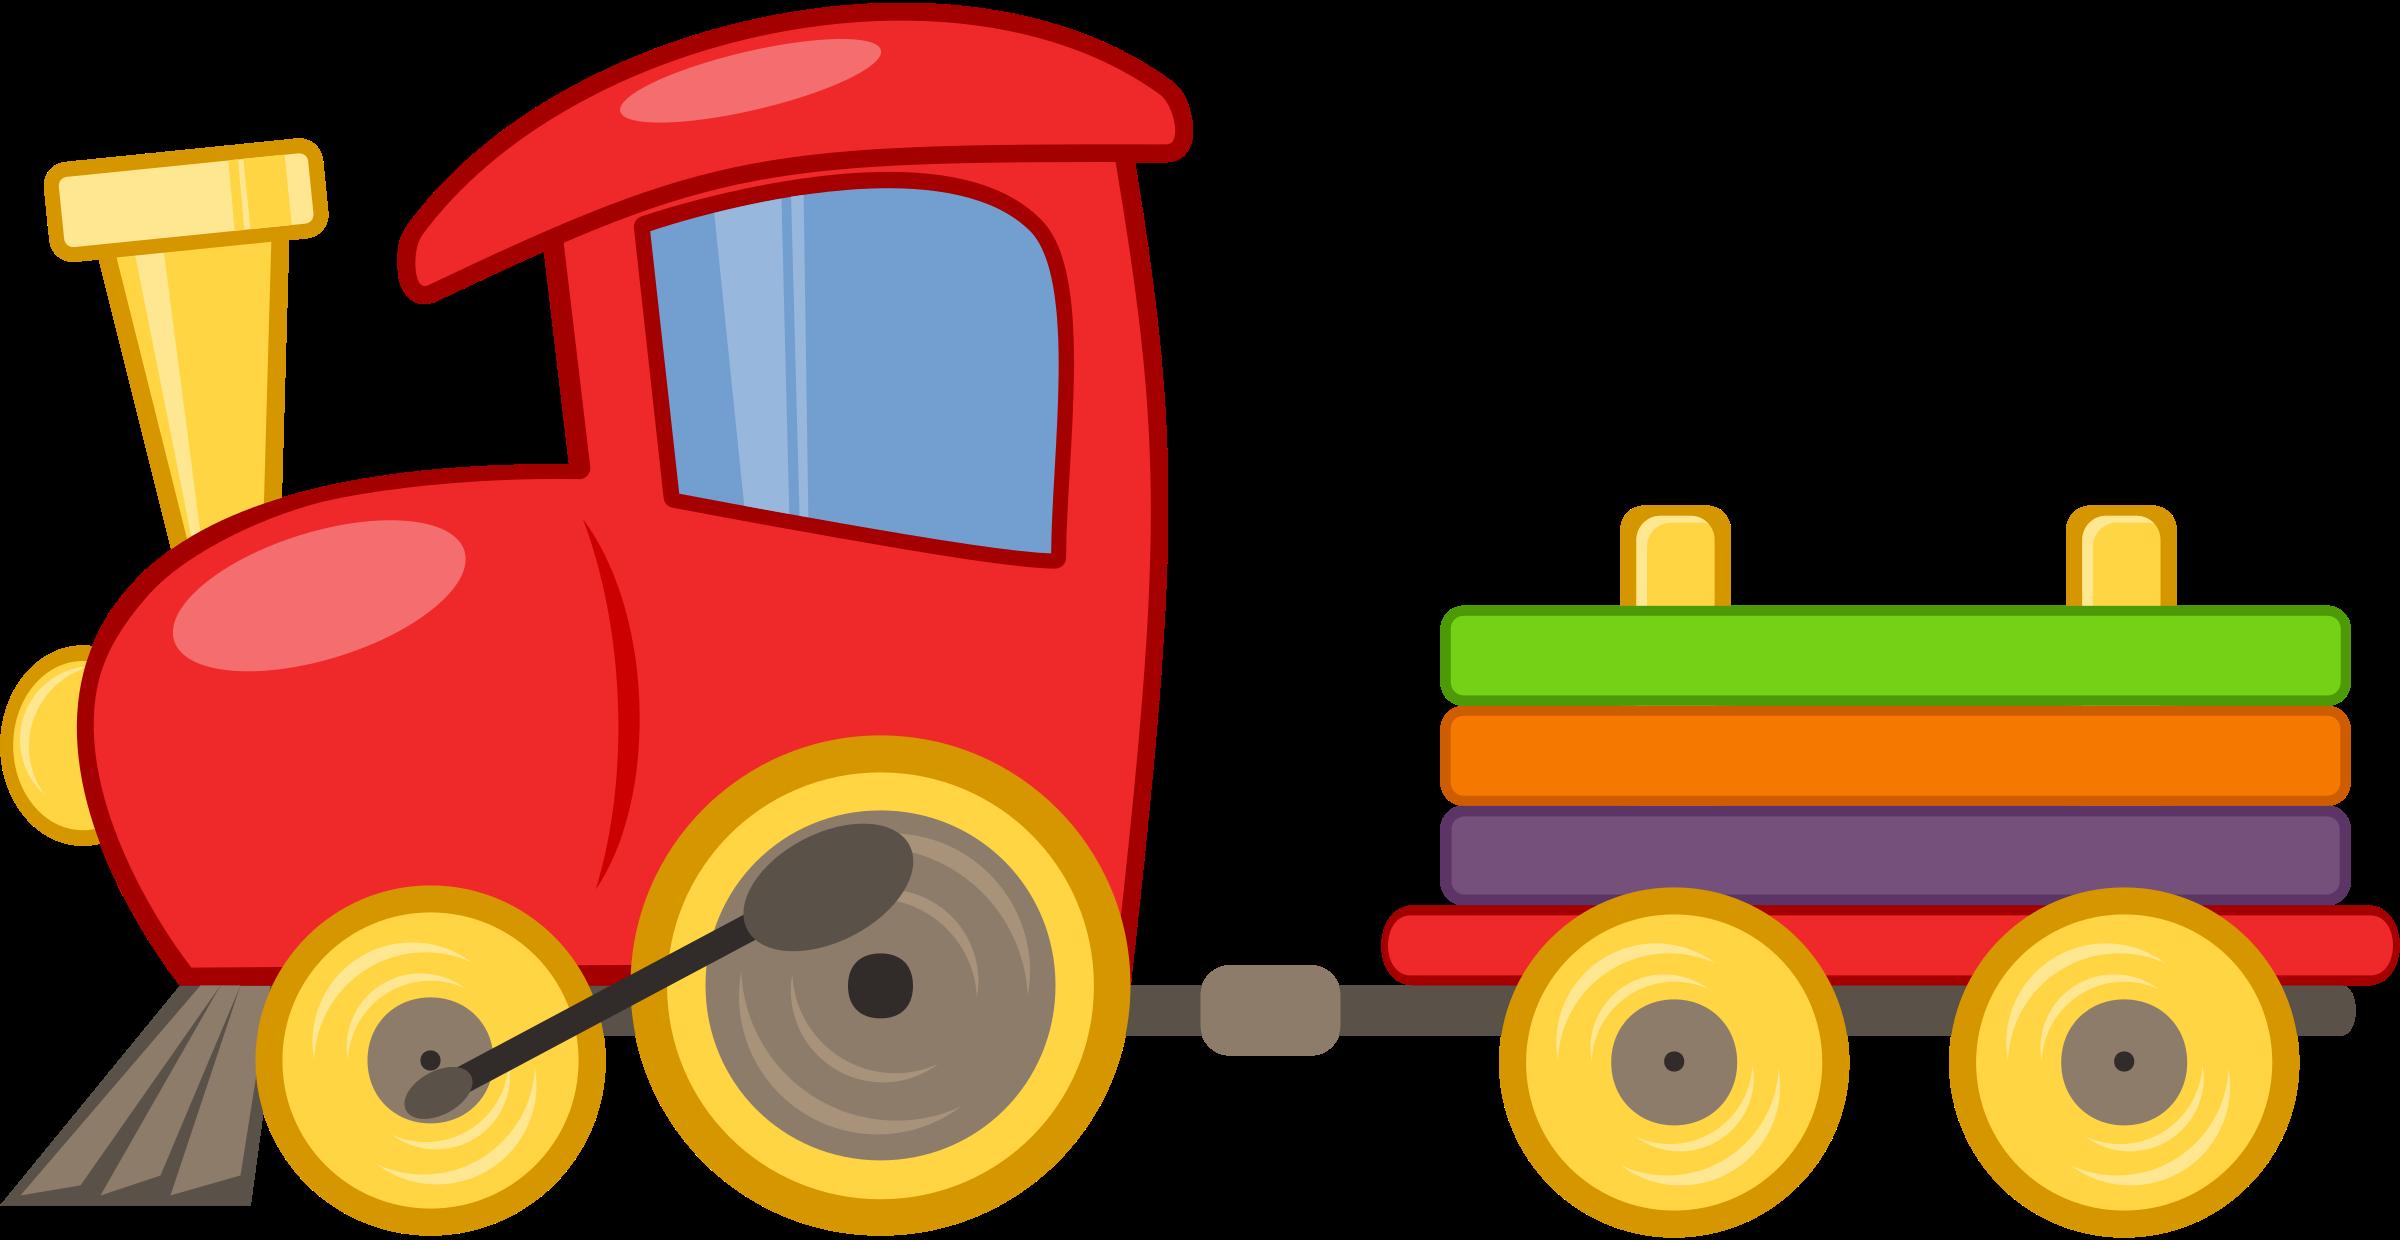 Engine clipart choo choo train. Short clip art images